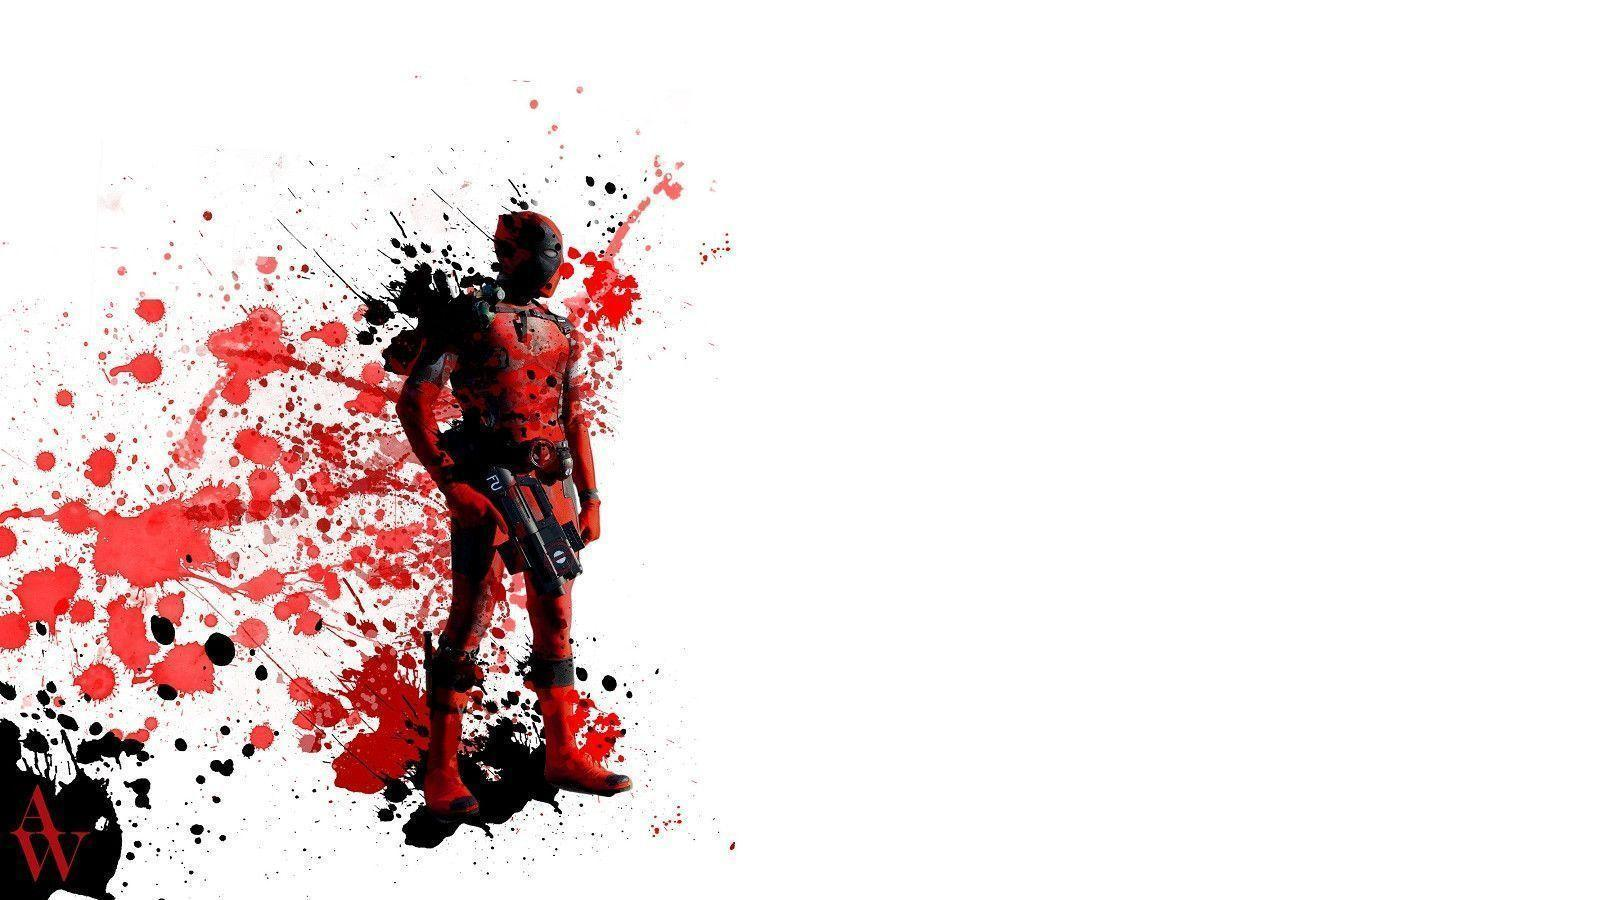 Deadpool Wallpaper HD Free - ToObjects.